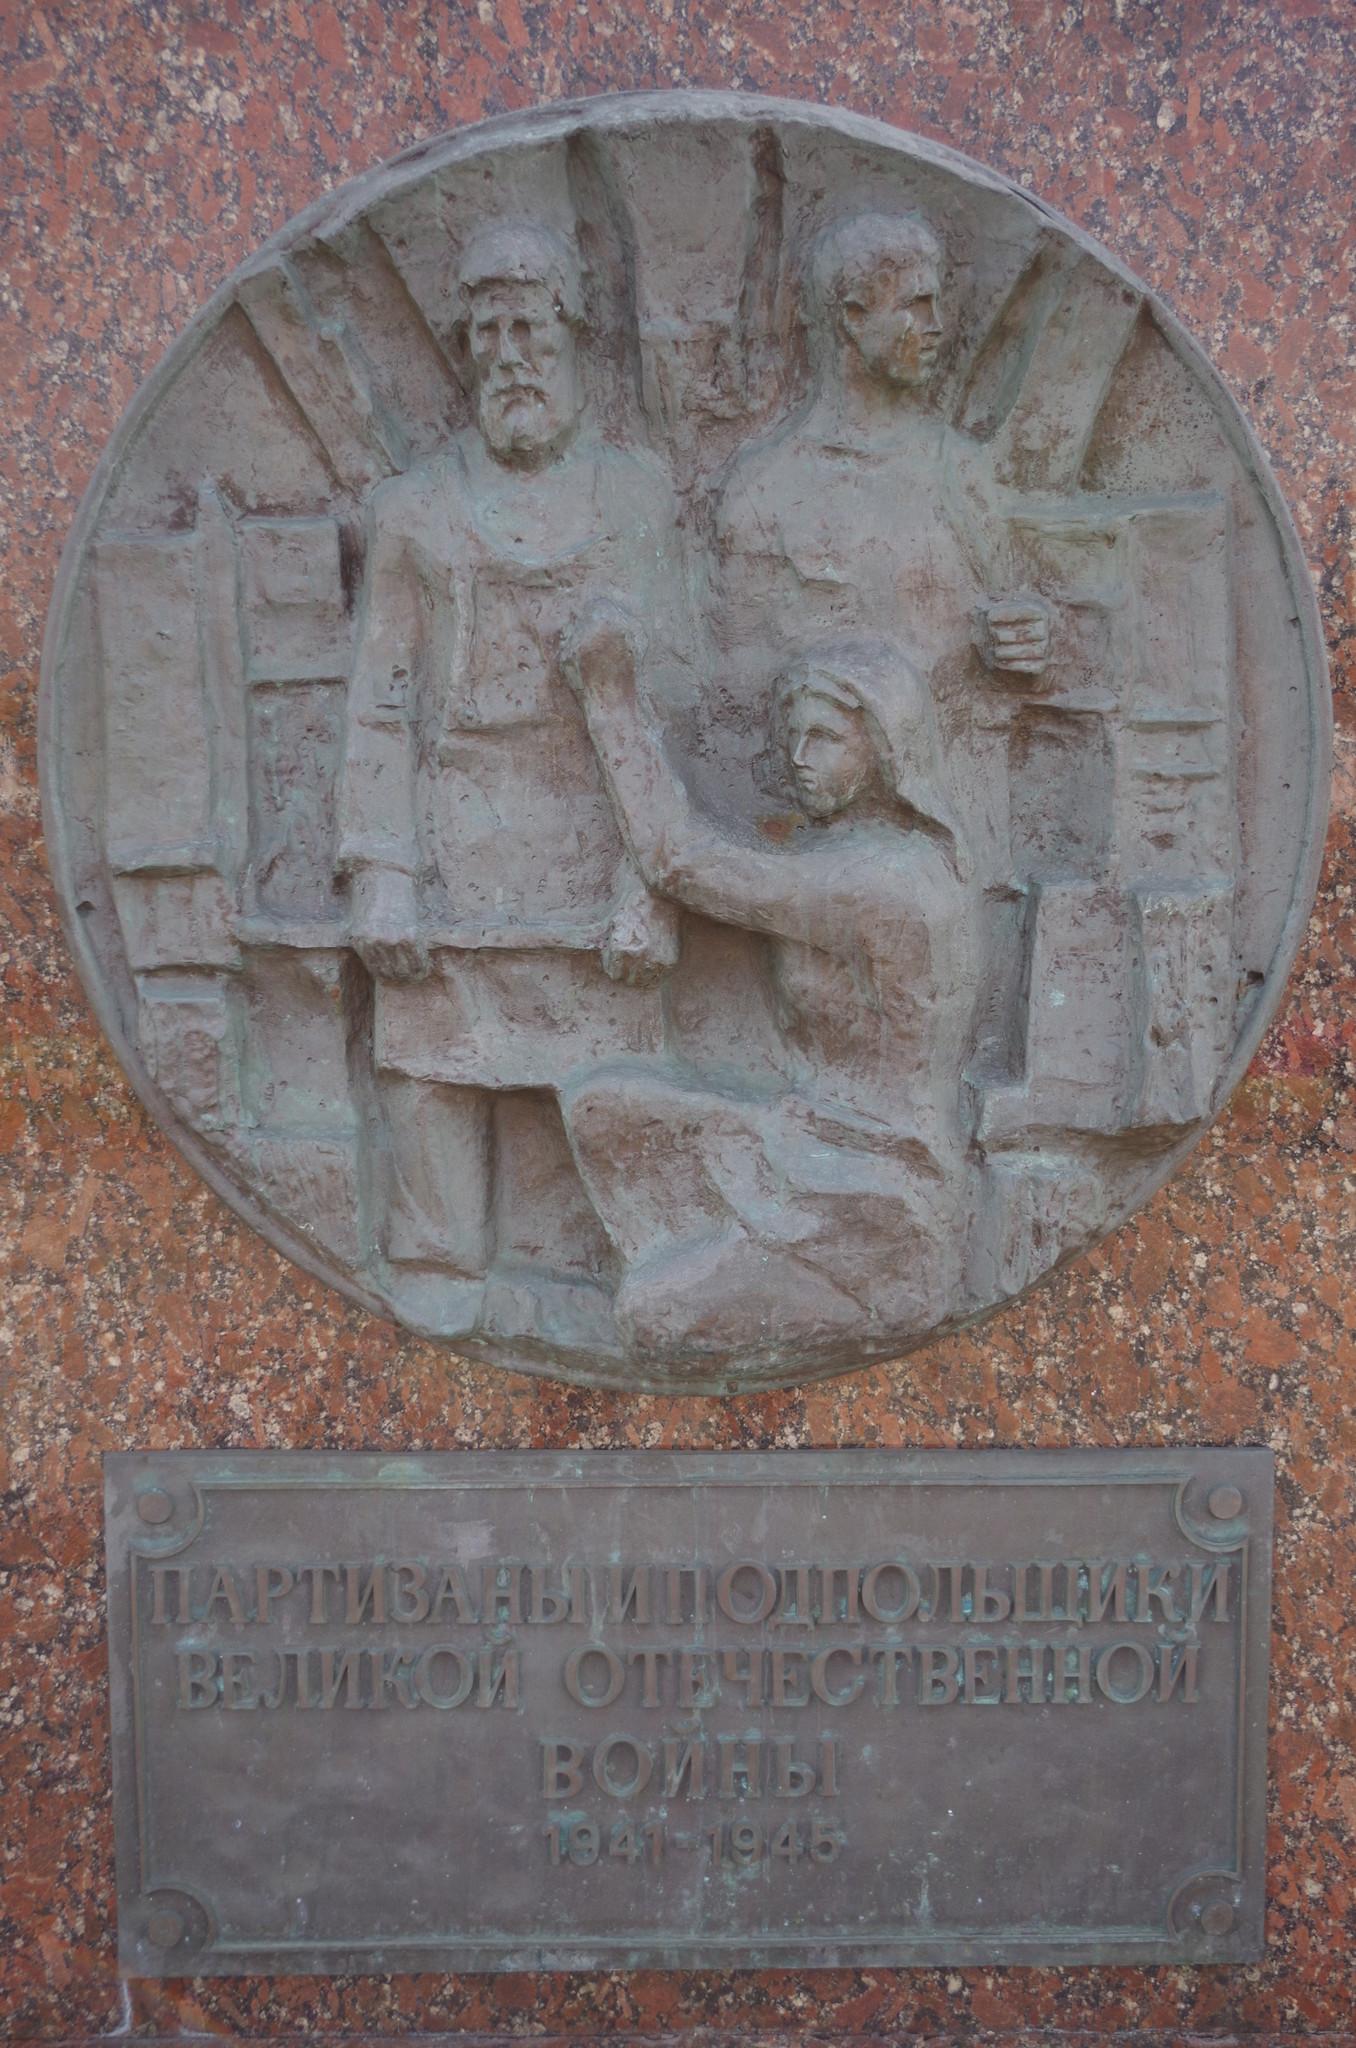 Главная аллея «Годы войны» в парке Победы